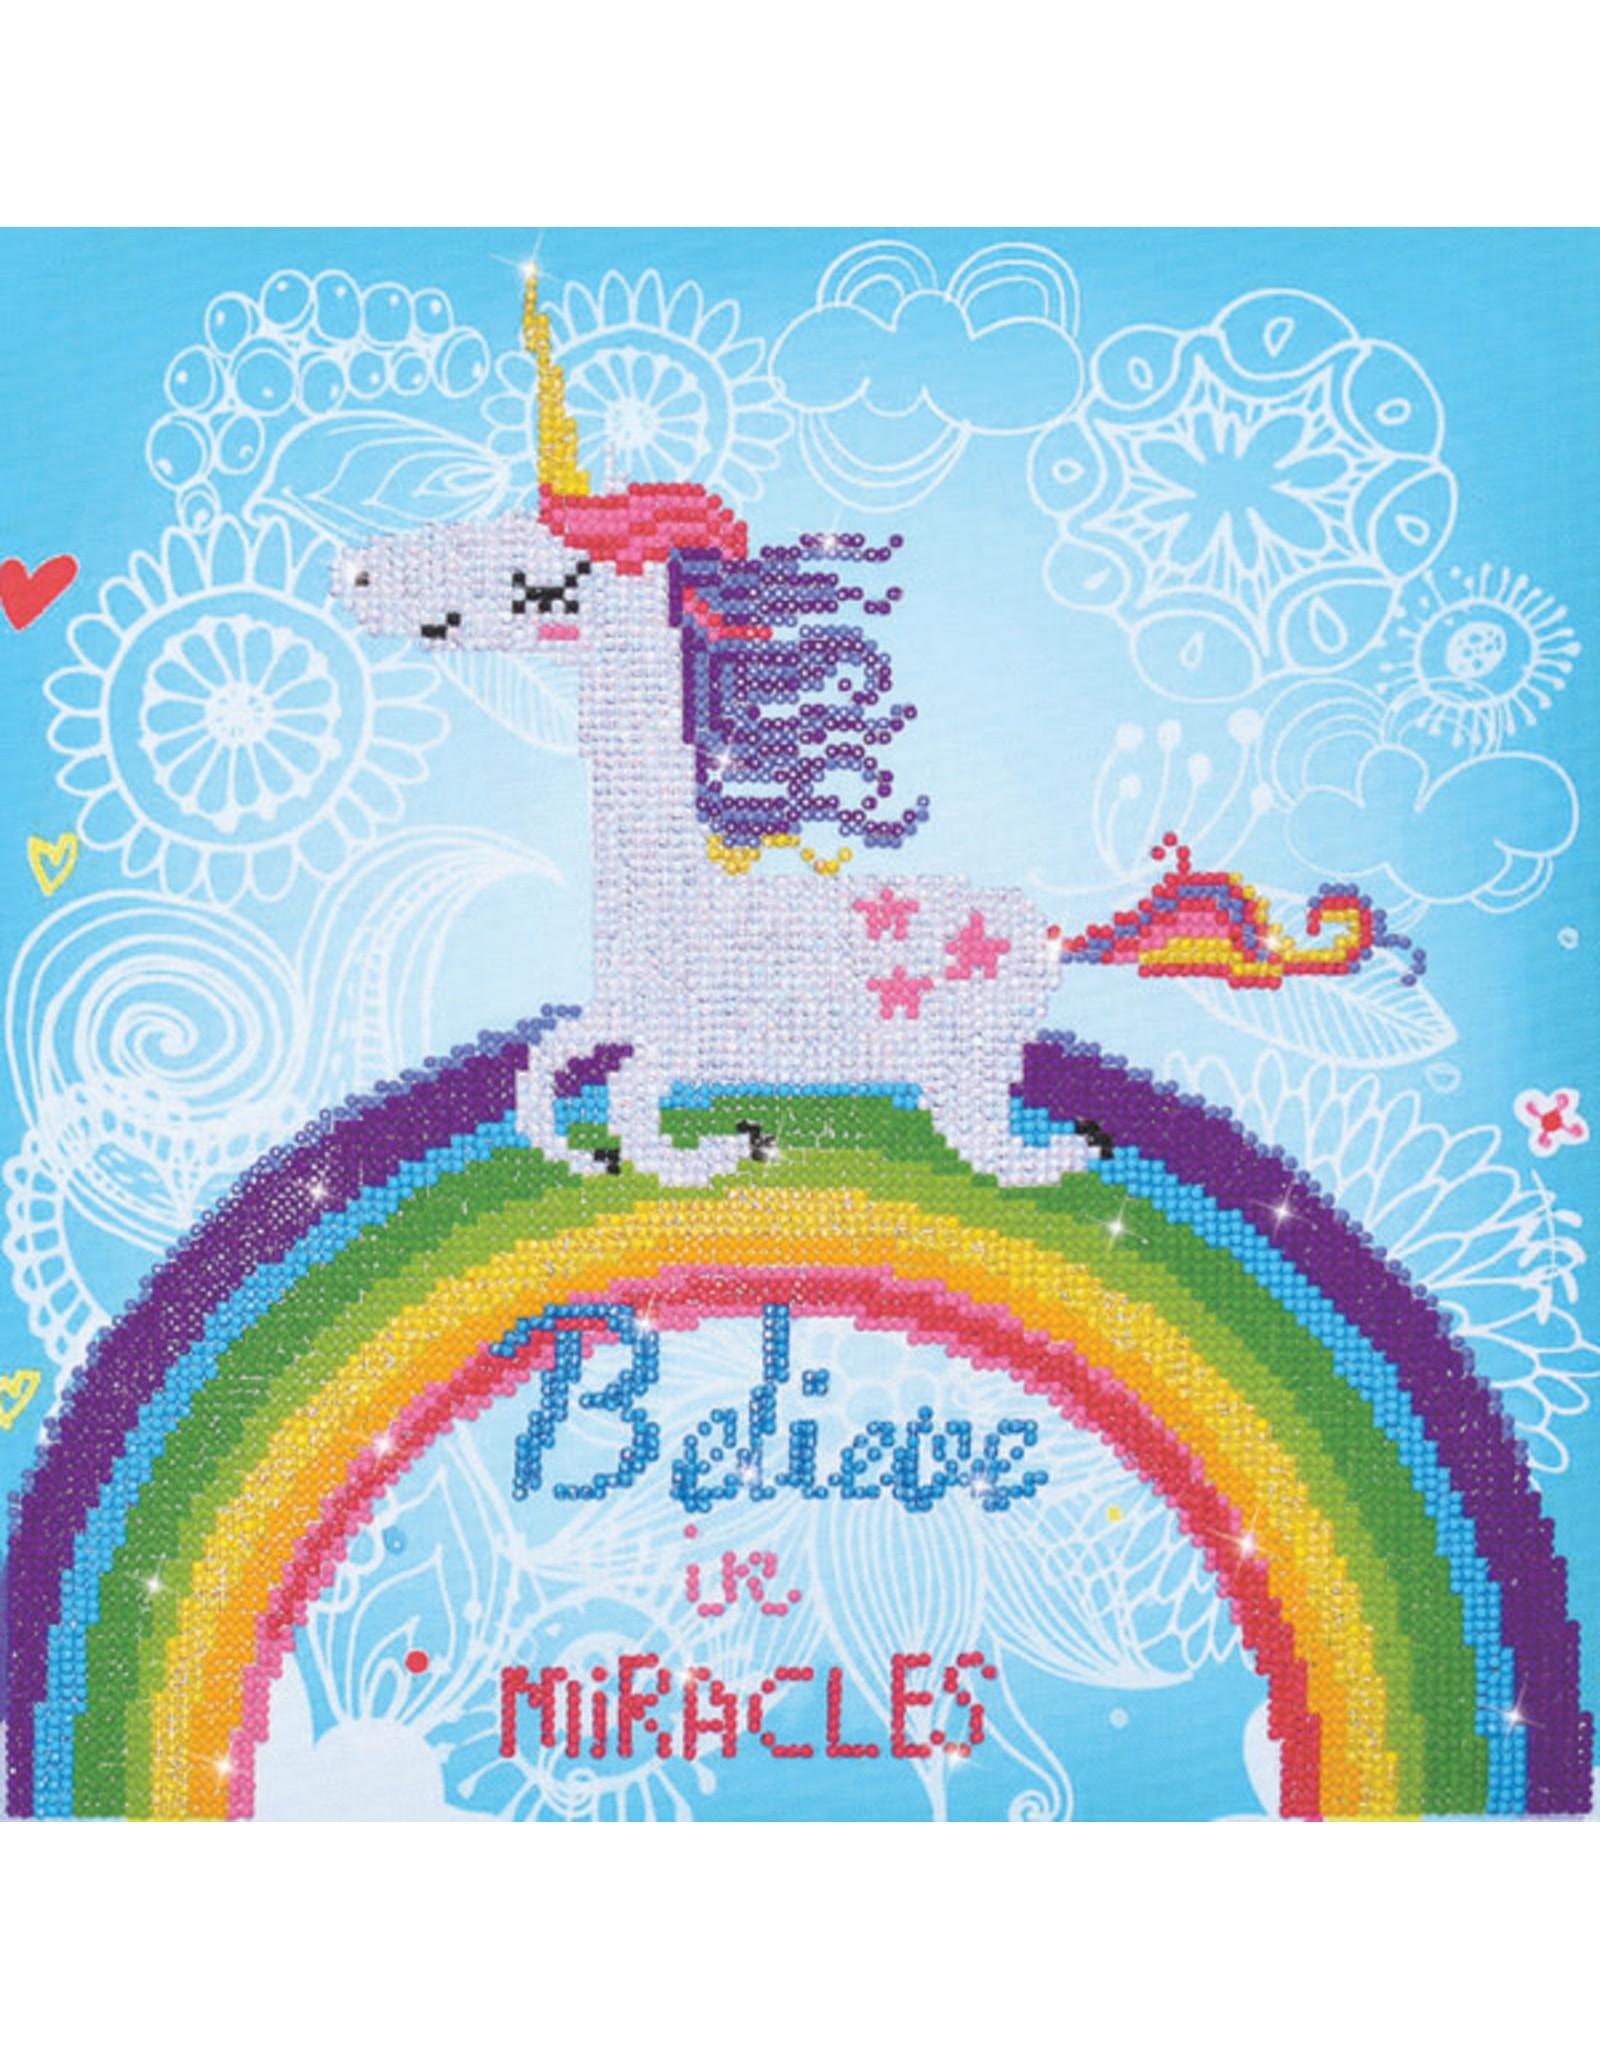 Diamond Dotz Believe in Miracles 35x35cm